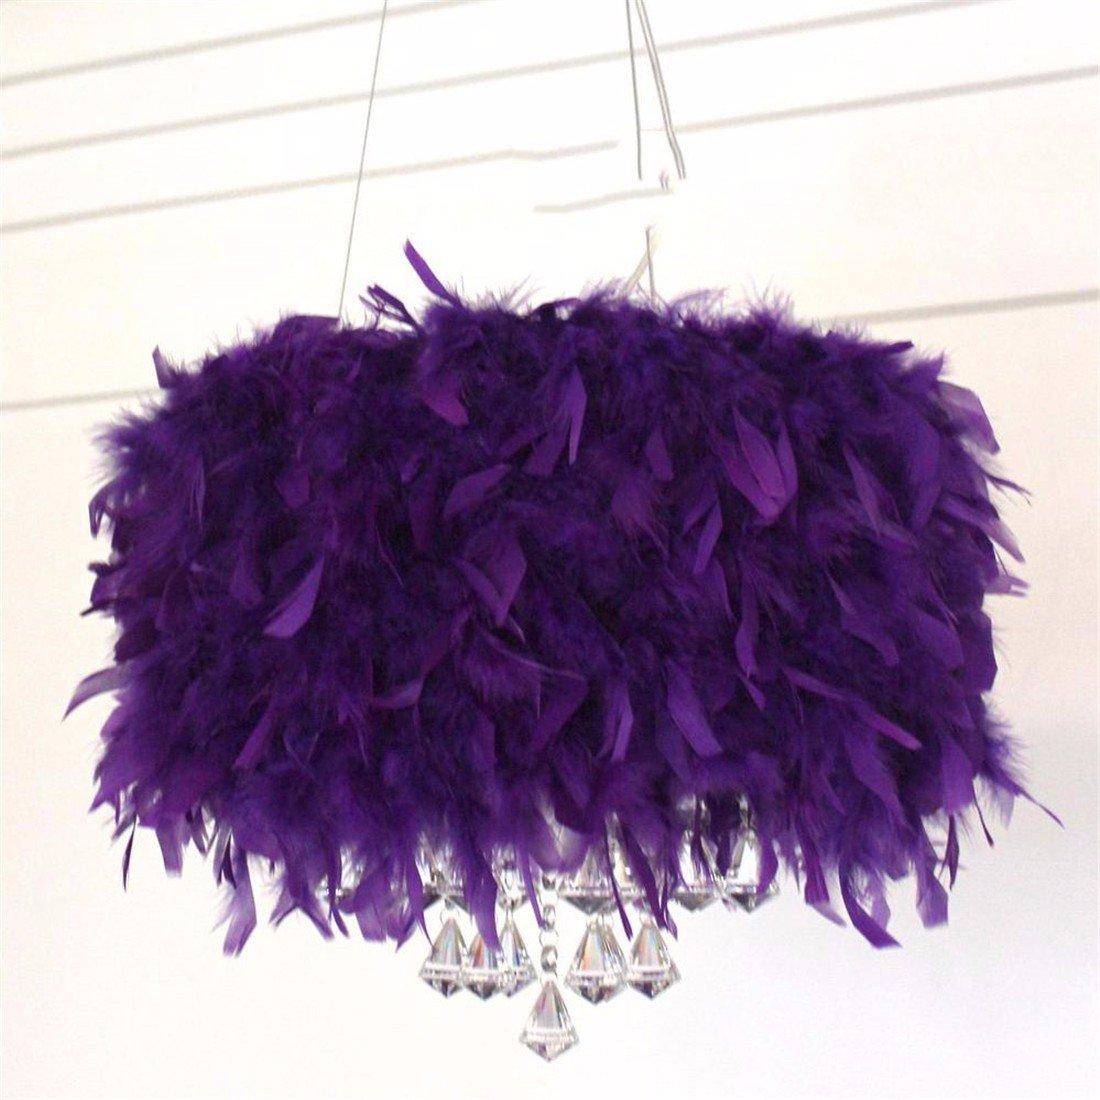 LAONA Creative crystal lamp, LED living room, study room, bedroom, simple modern European romantic feather pendant lamp,35CM-purple